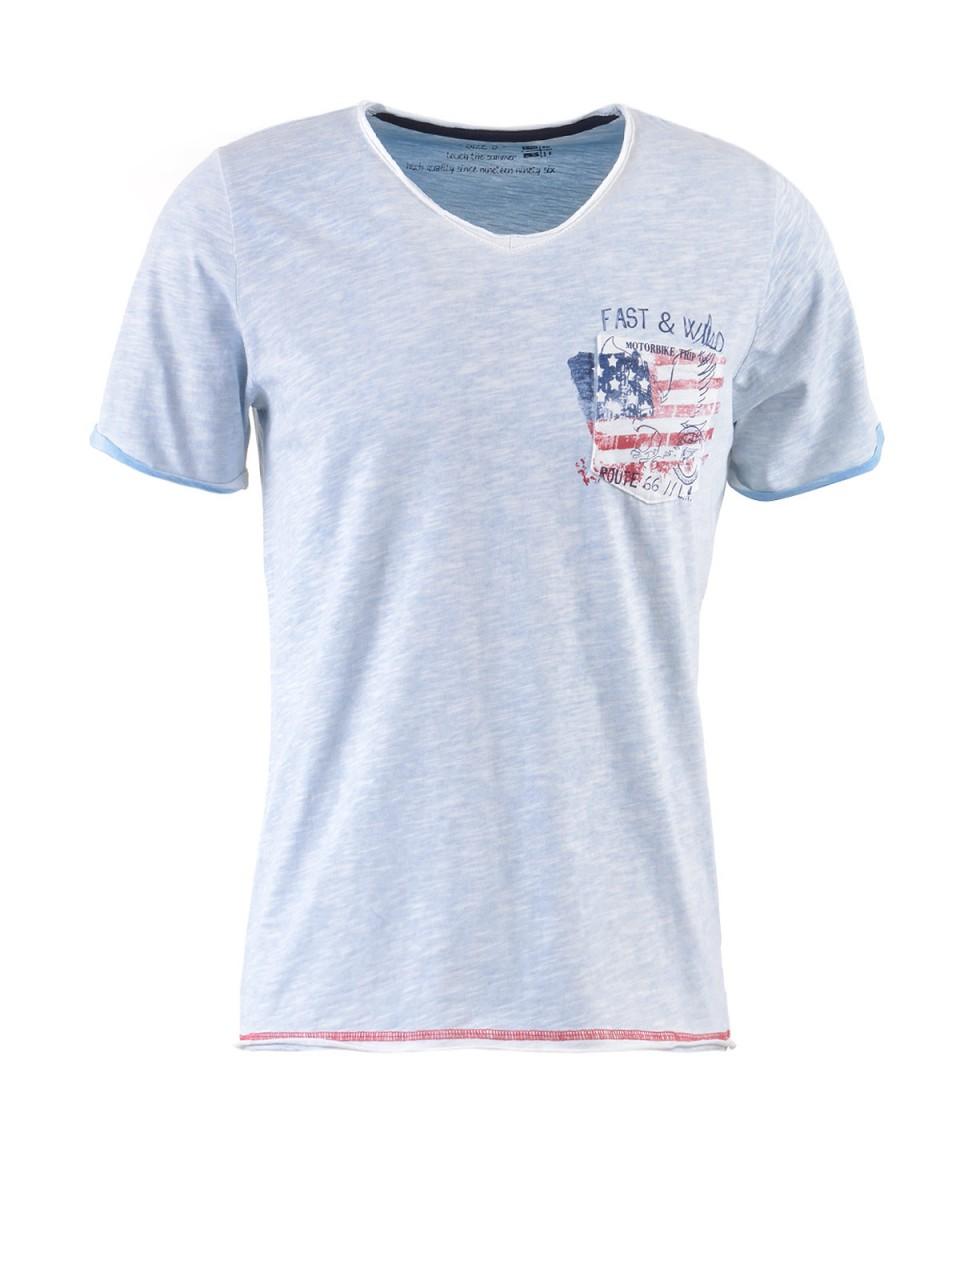 milano-italy-herren-t-shirt-blau